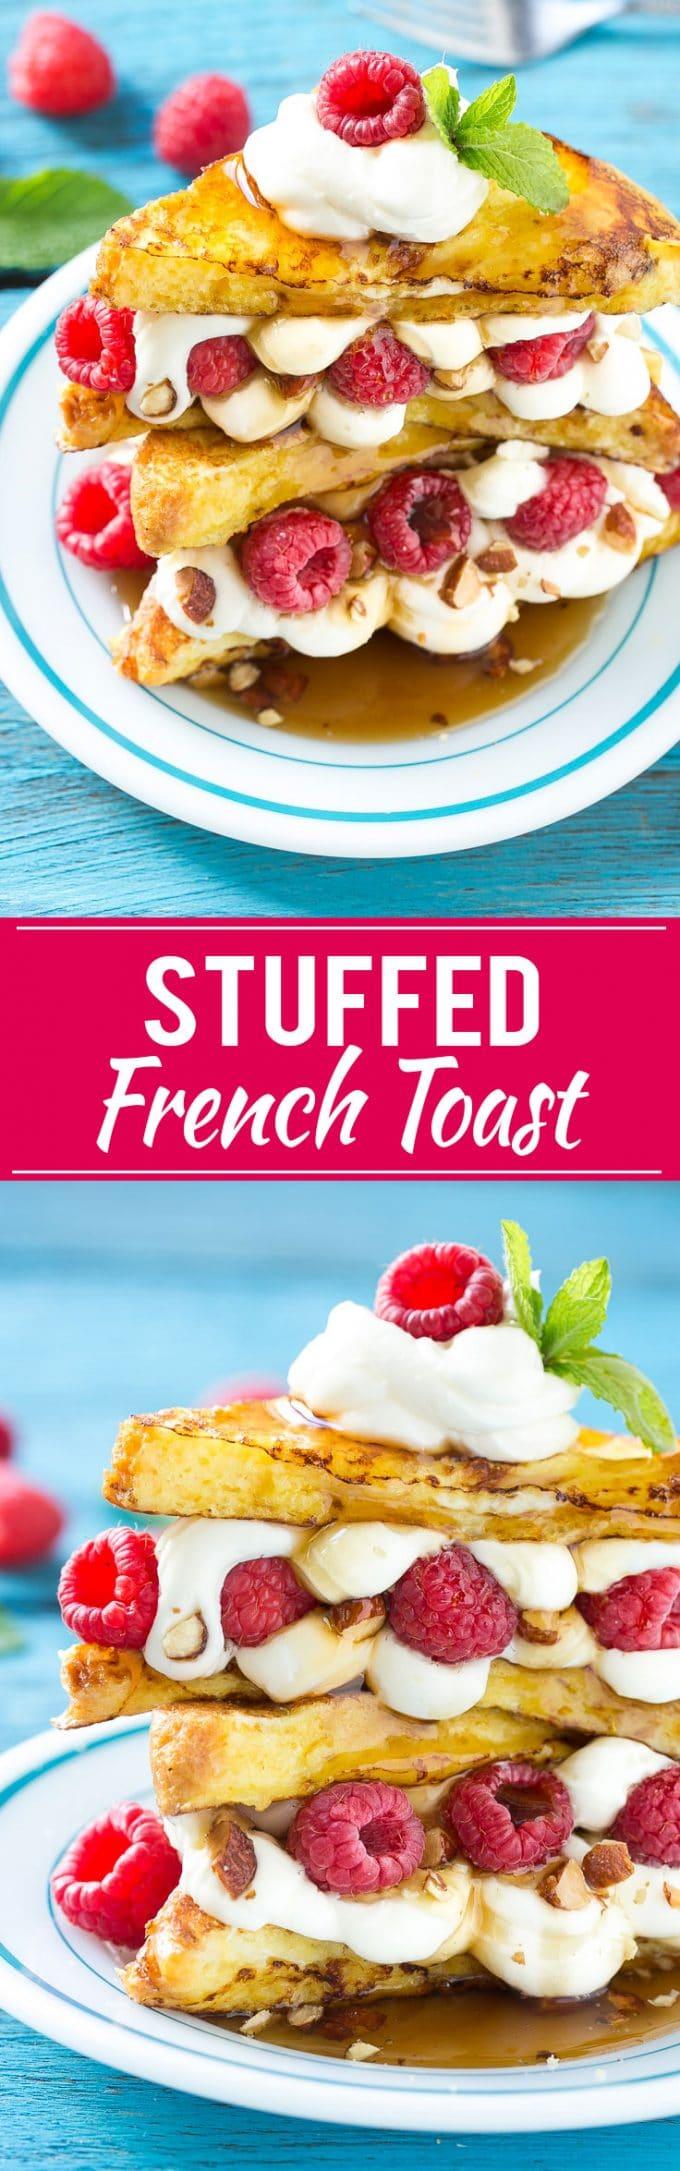 Stuffed French Toast | Cream Cheese Stuffed French Toast | French Toast Recipe #frenchtoast #raspberry #creamcheese #breakfast #brunch #dinneratthezoo